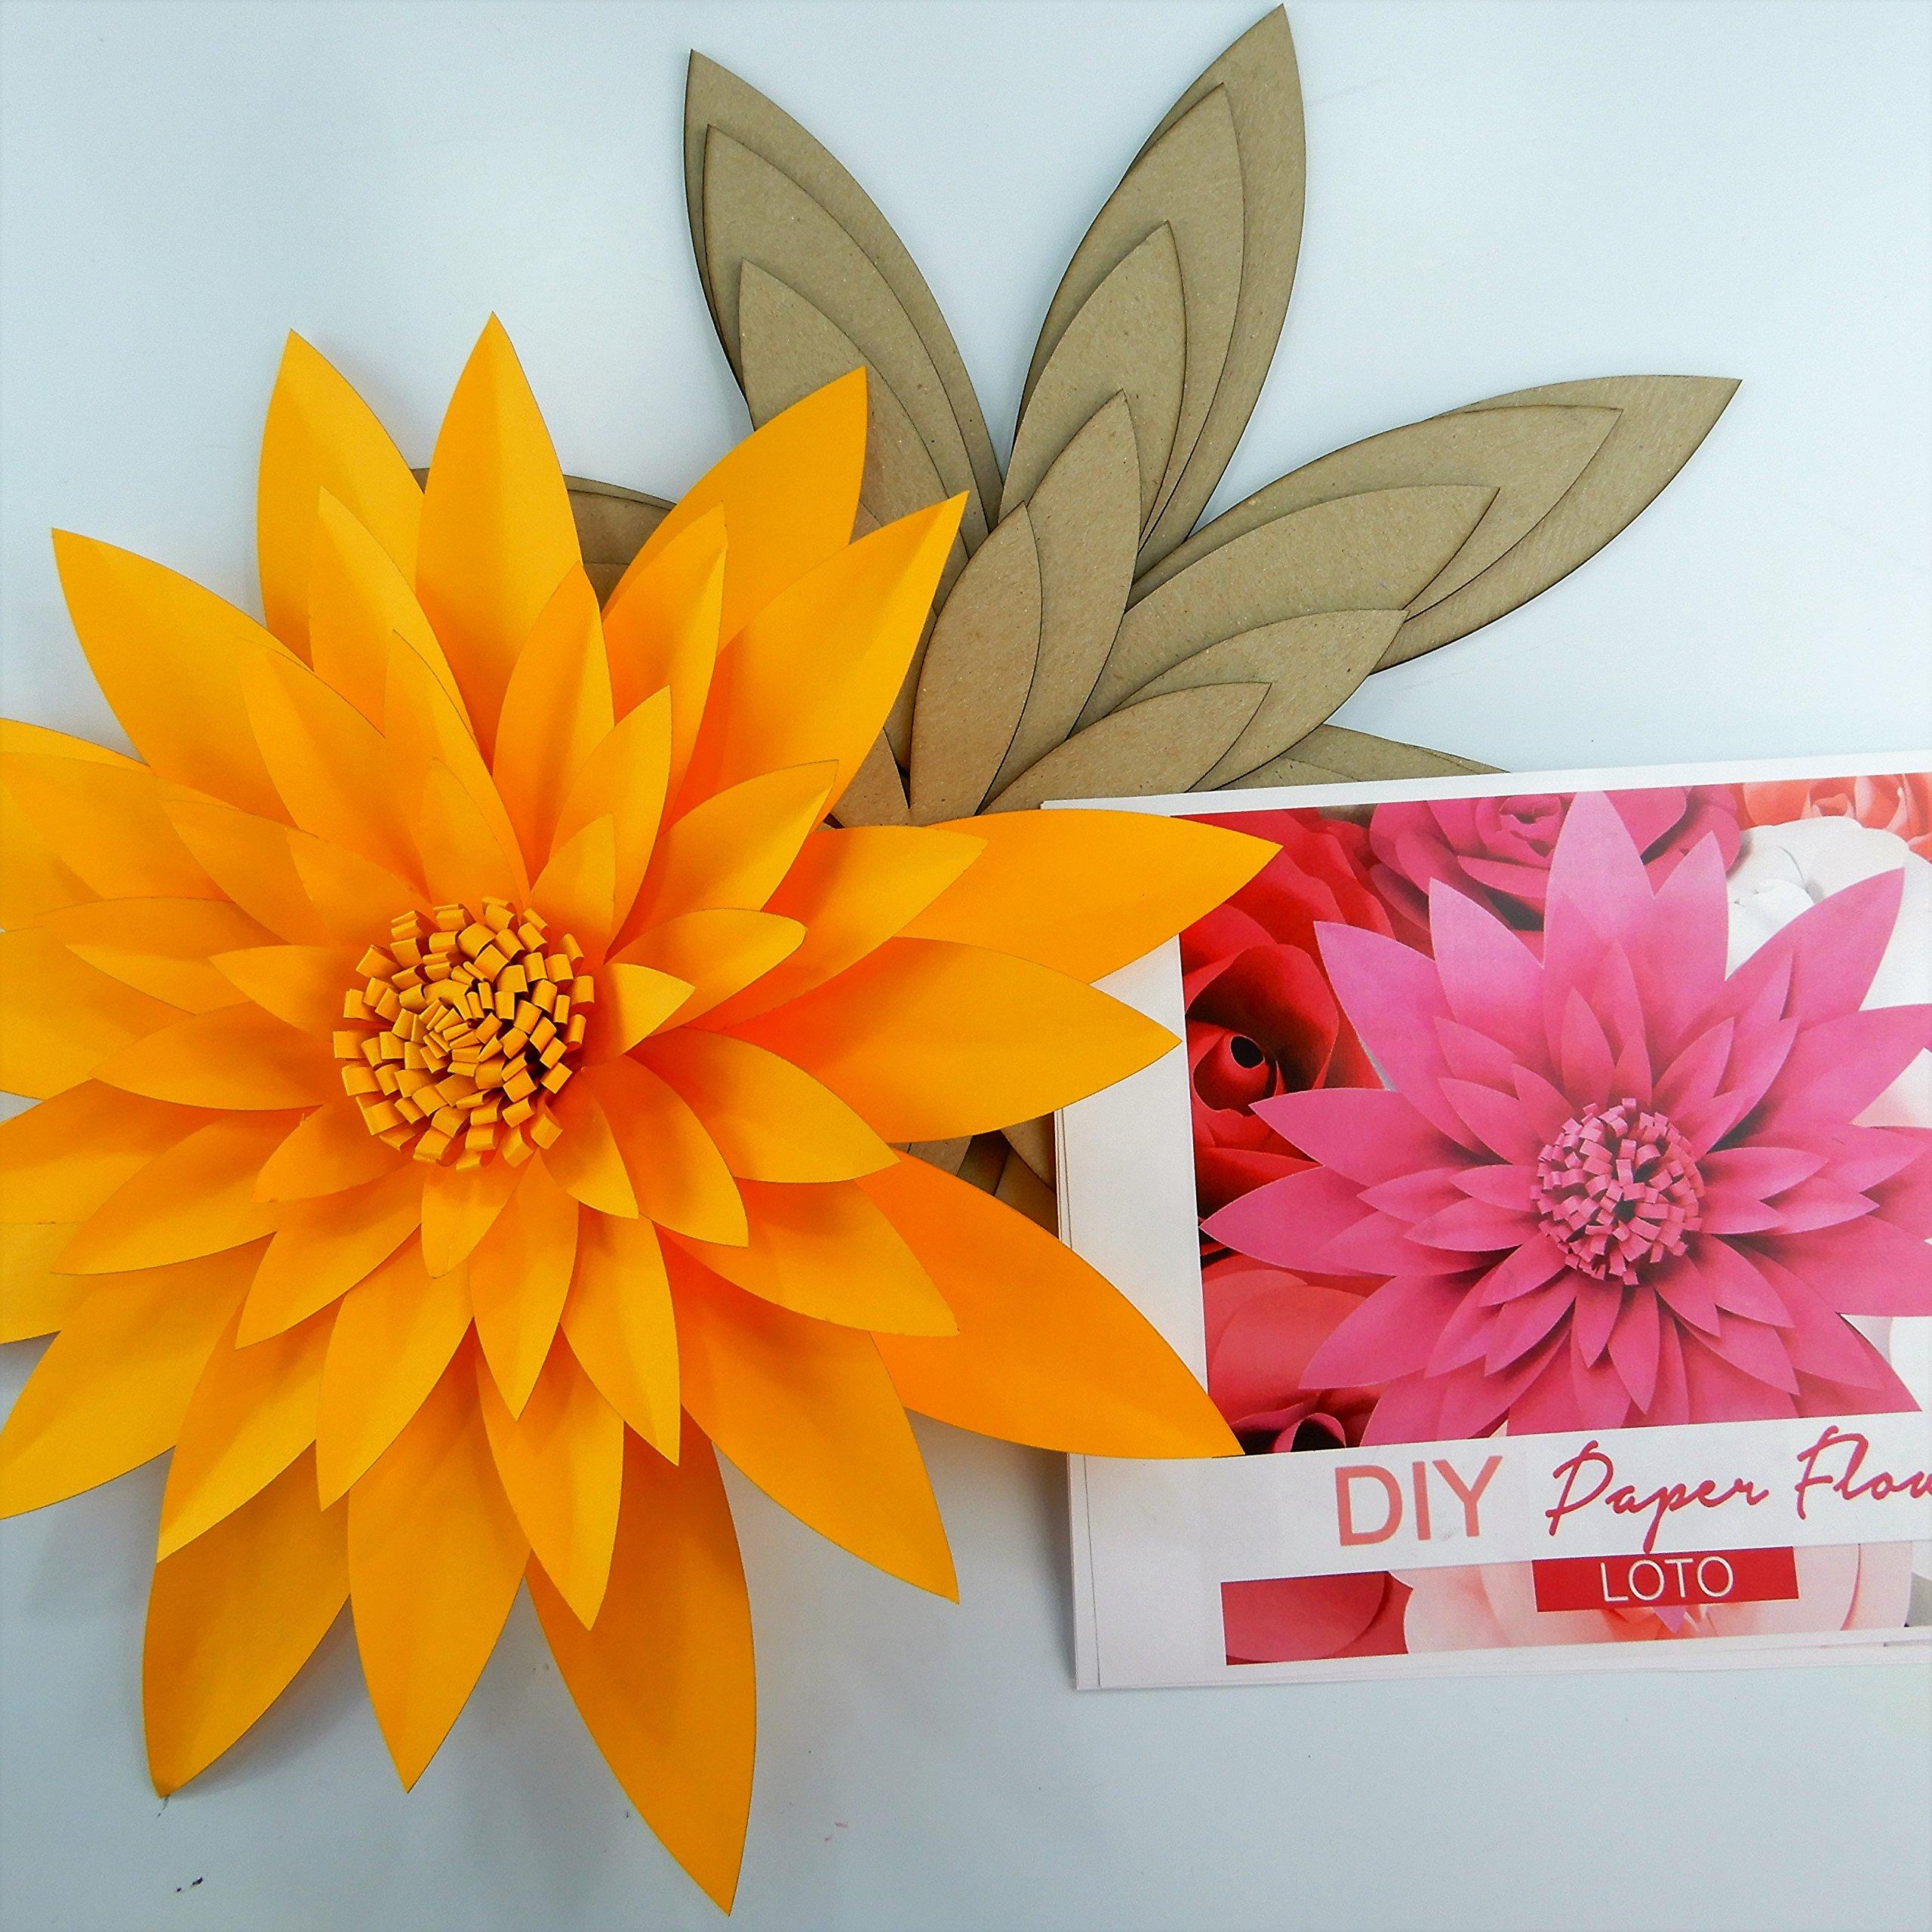 Cheap Paper Flower Backdrop Find Paper Flower Backdrop Deals On